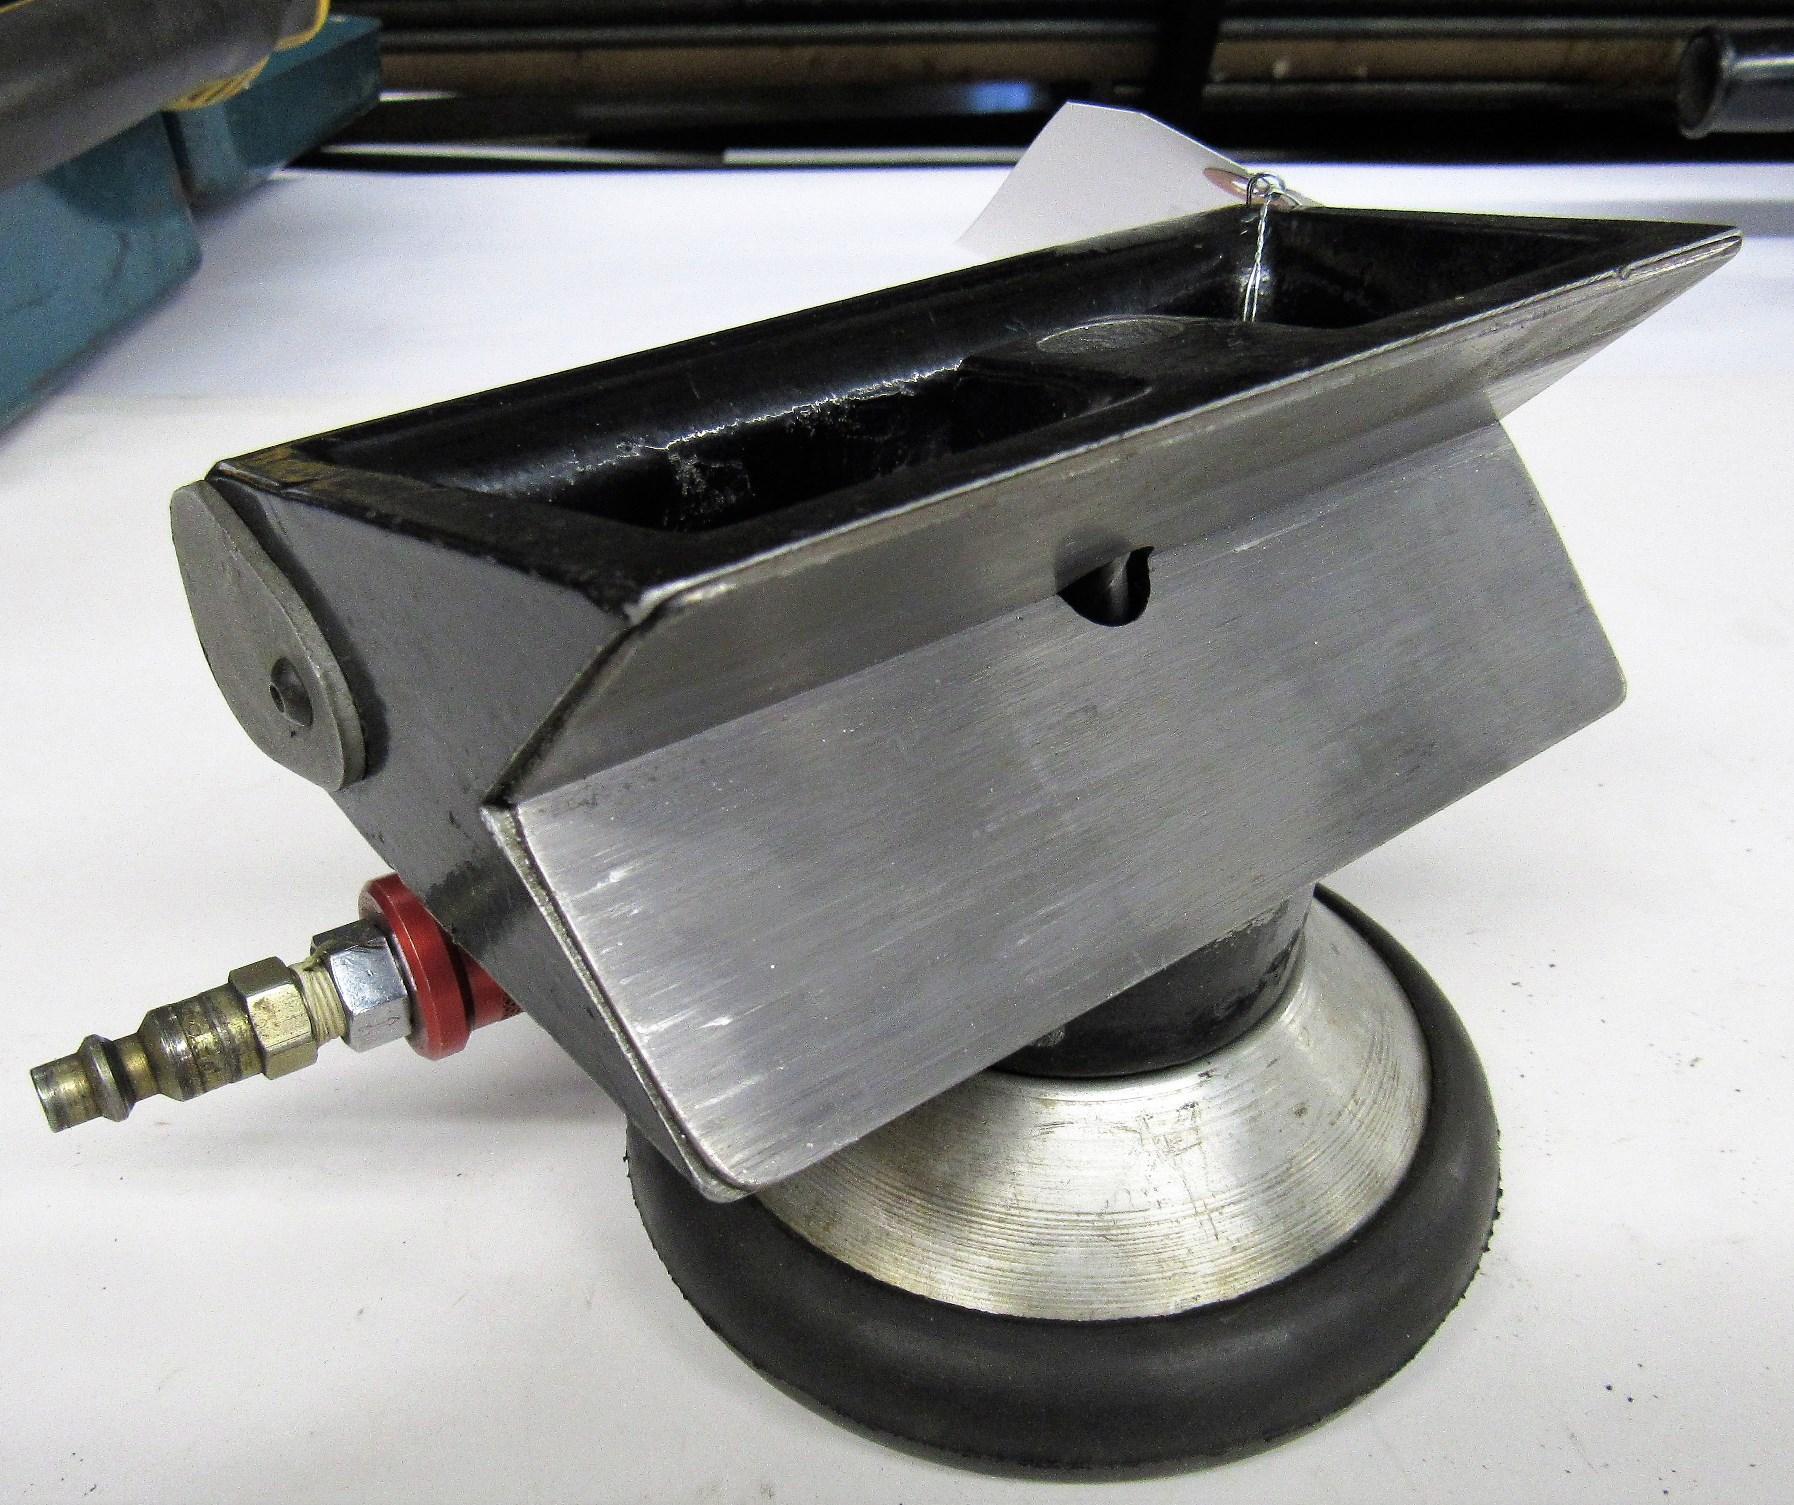 Heck Industries Pnuematic Turbo-Burr DeBurring Tool